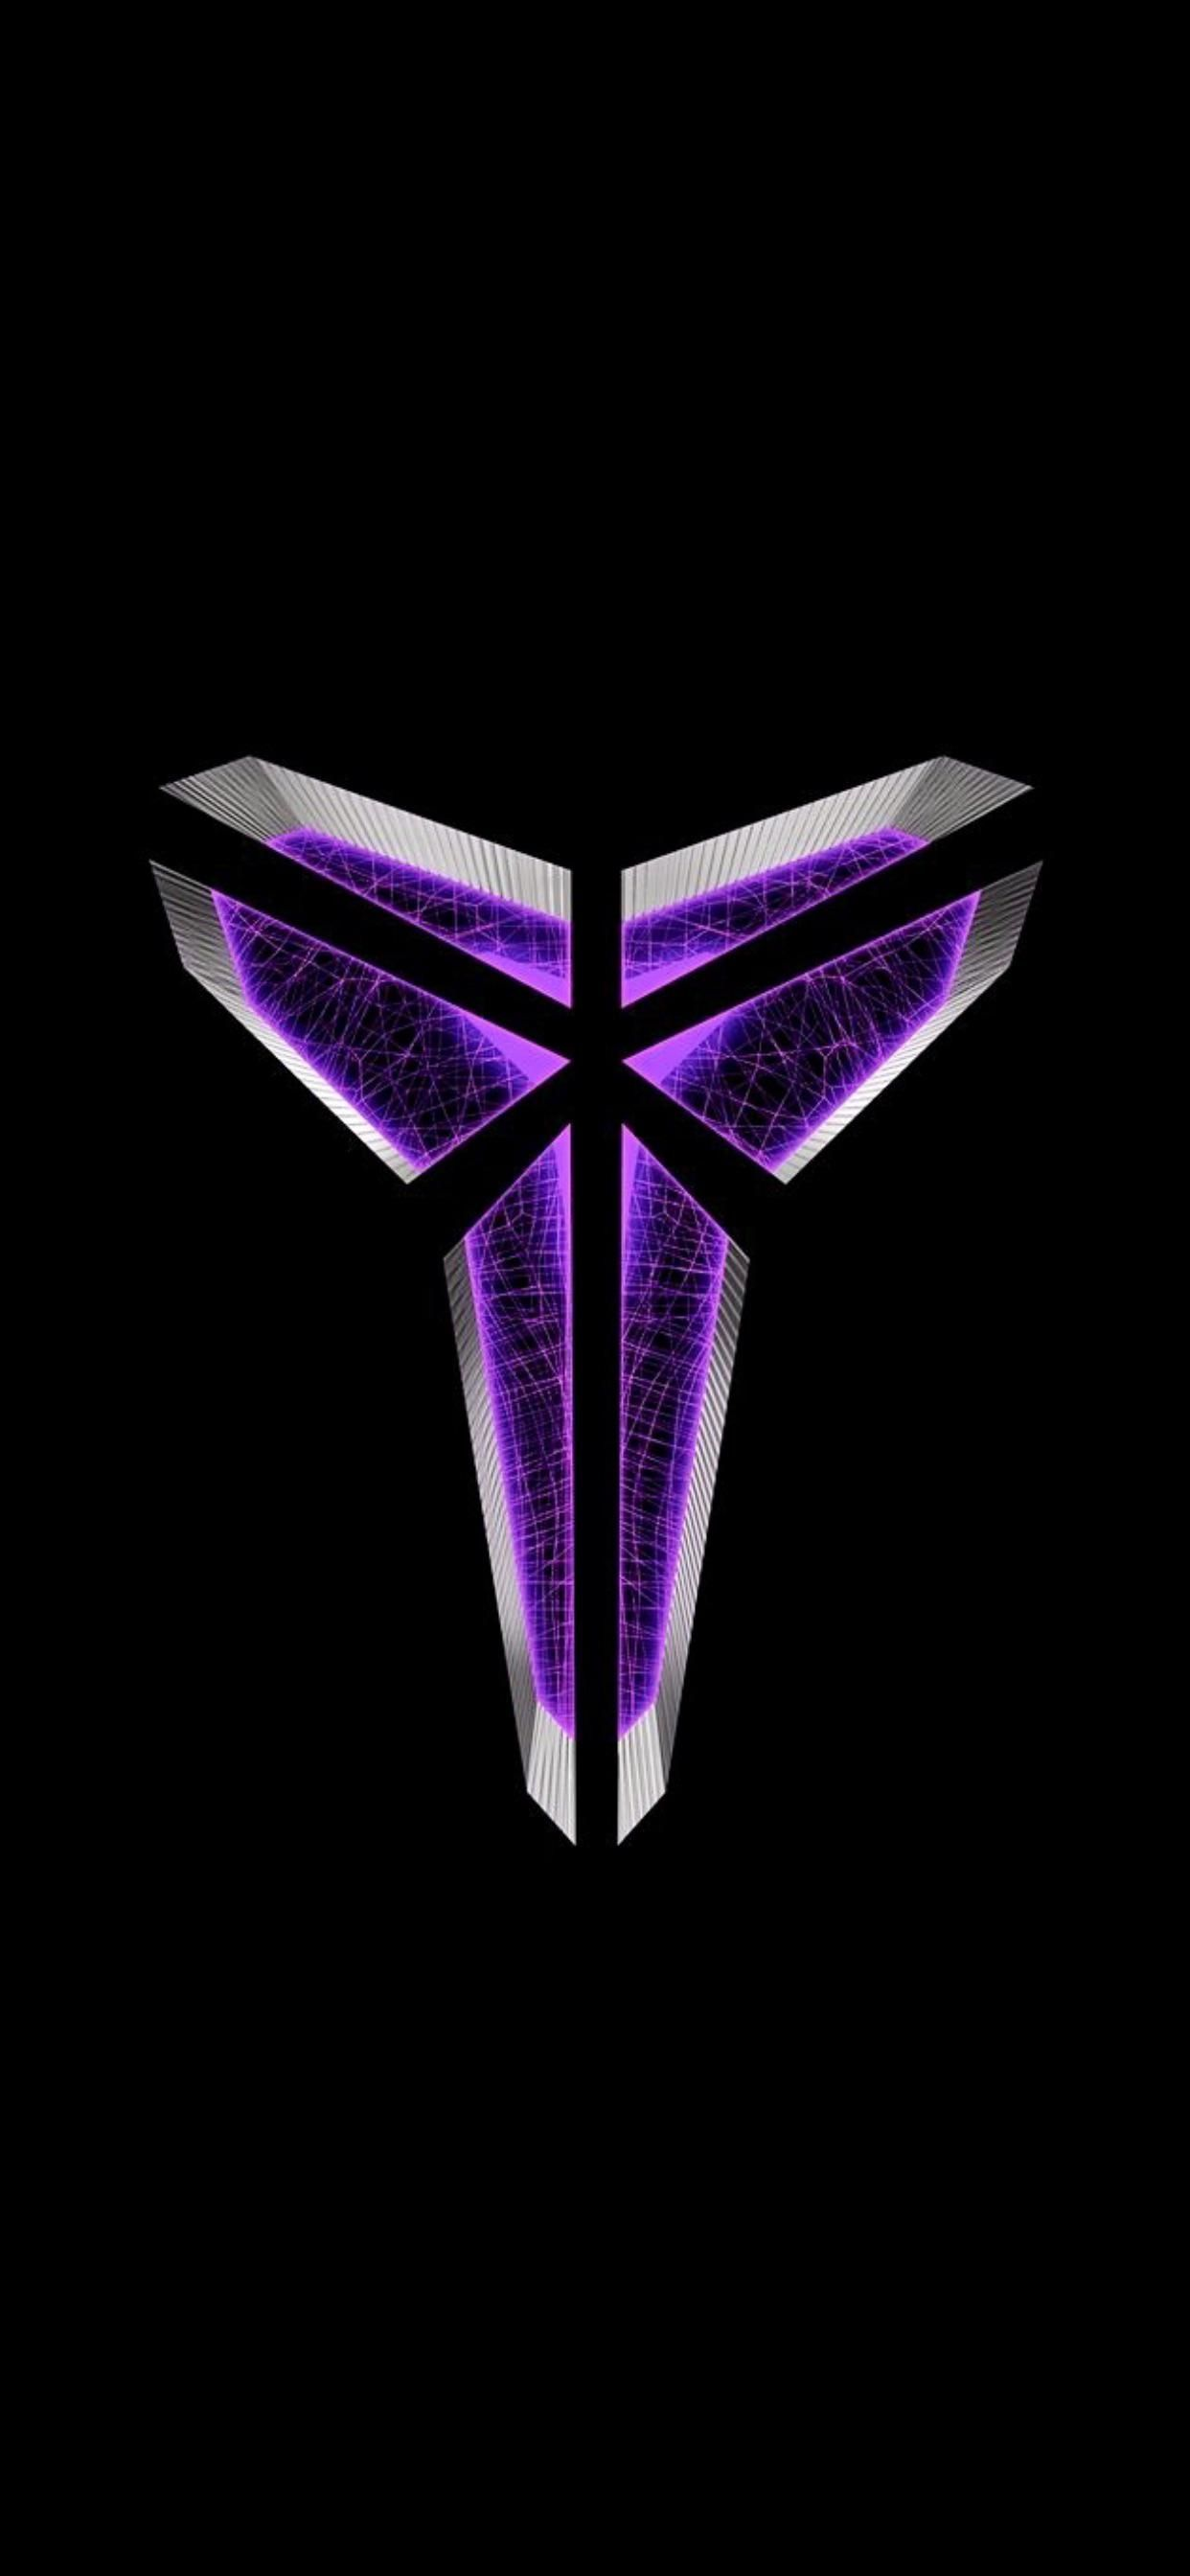 In memory of Kobe heres a purple Mamba logo in 2020 Kobe